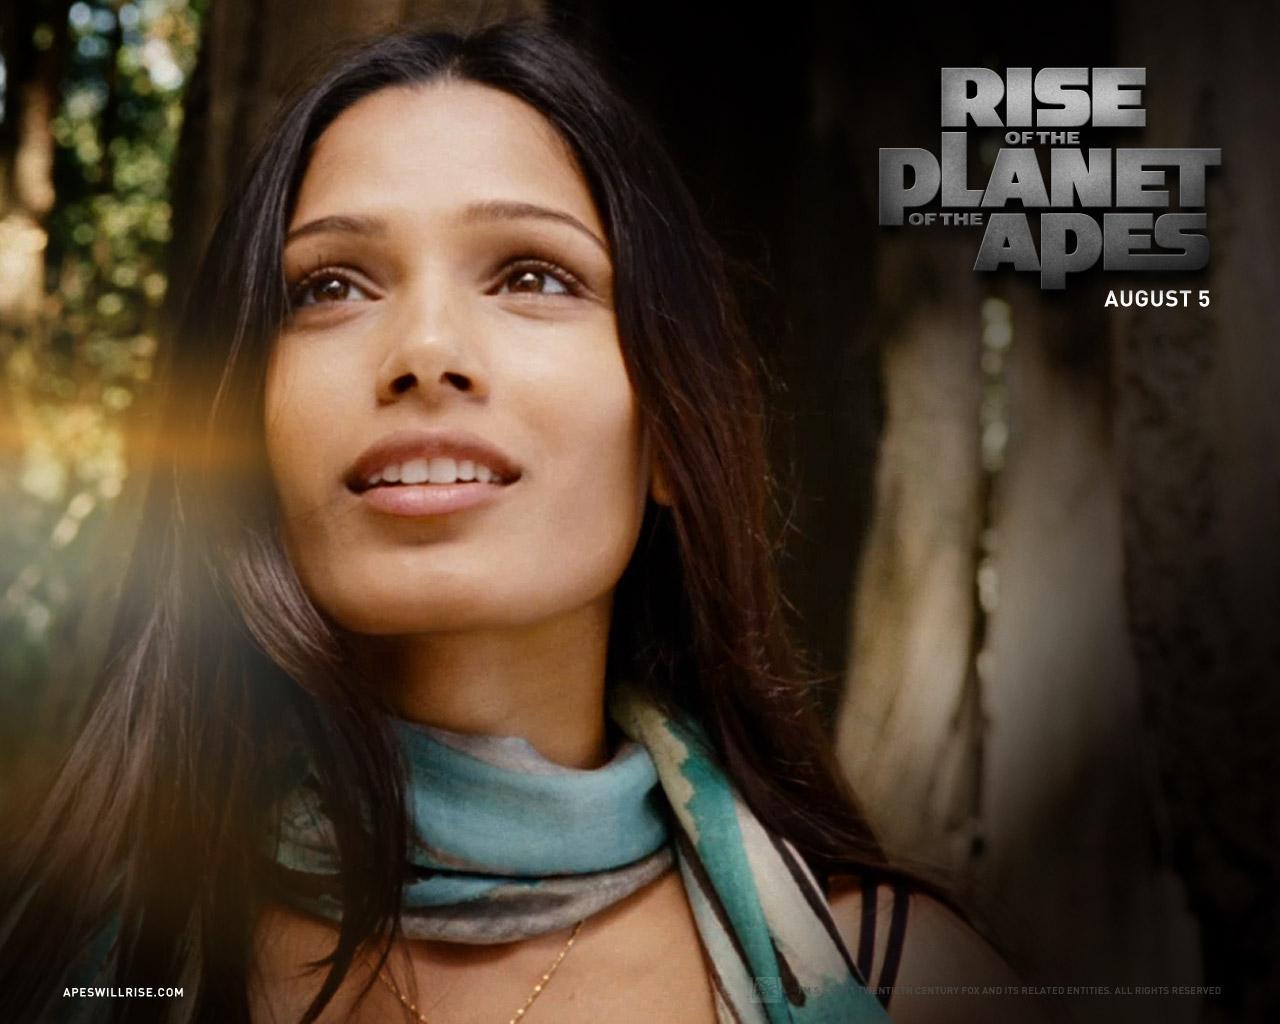 http://1.bp.blogspot.com/-aBP4VYV6w4M/TkVsvAAlooI/AAAAAAAAFag/Gx8dEs3QWN4/s1600/Freida_Pinto_in_Rise_of_the_Planet_of_the_Apes_Wallpaper_3_800.jpg